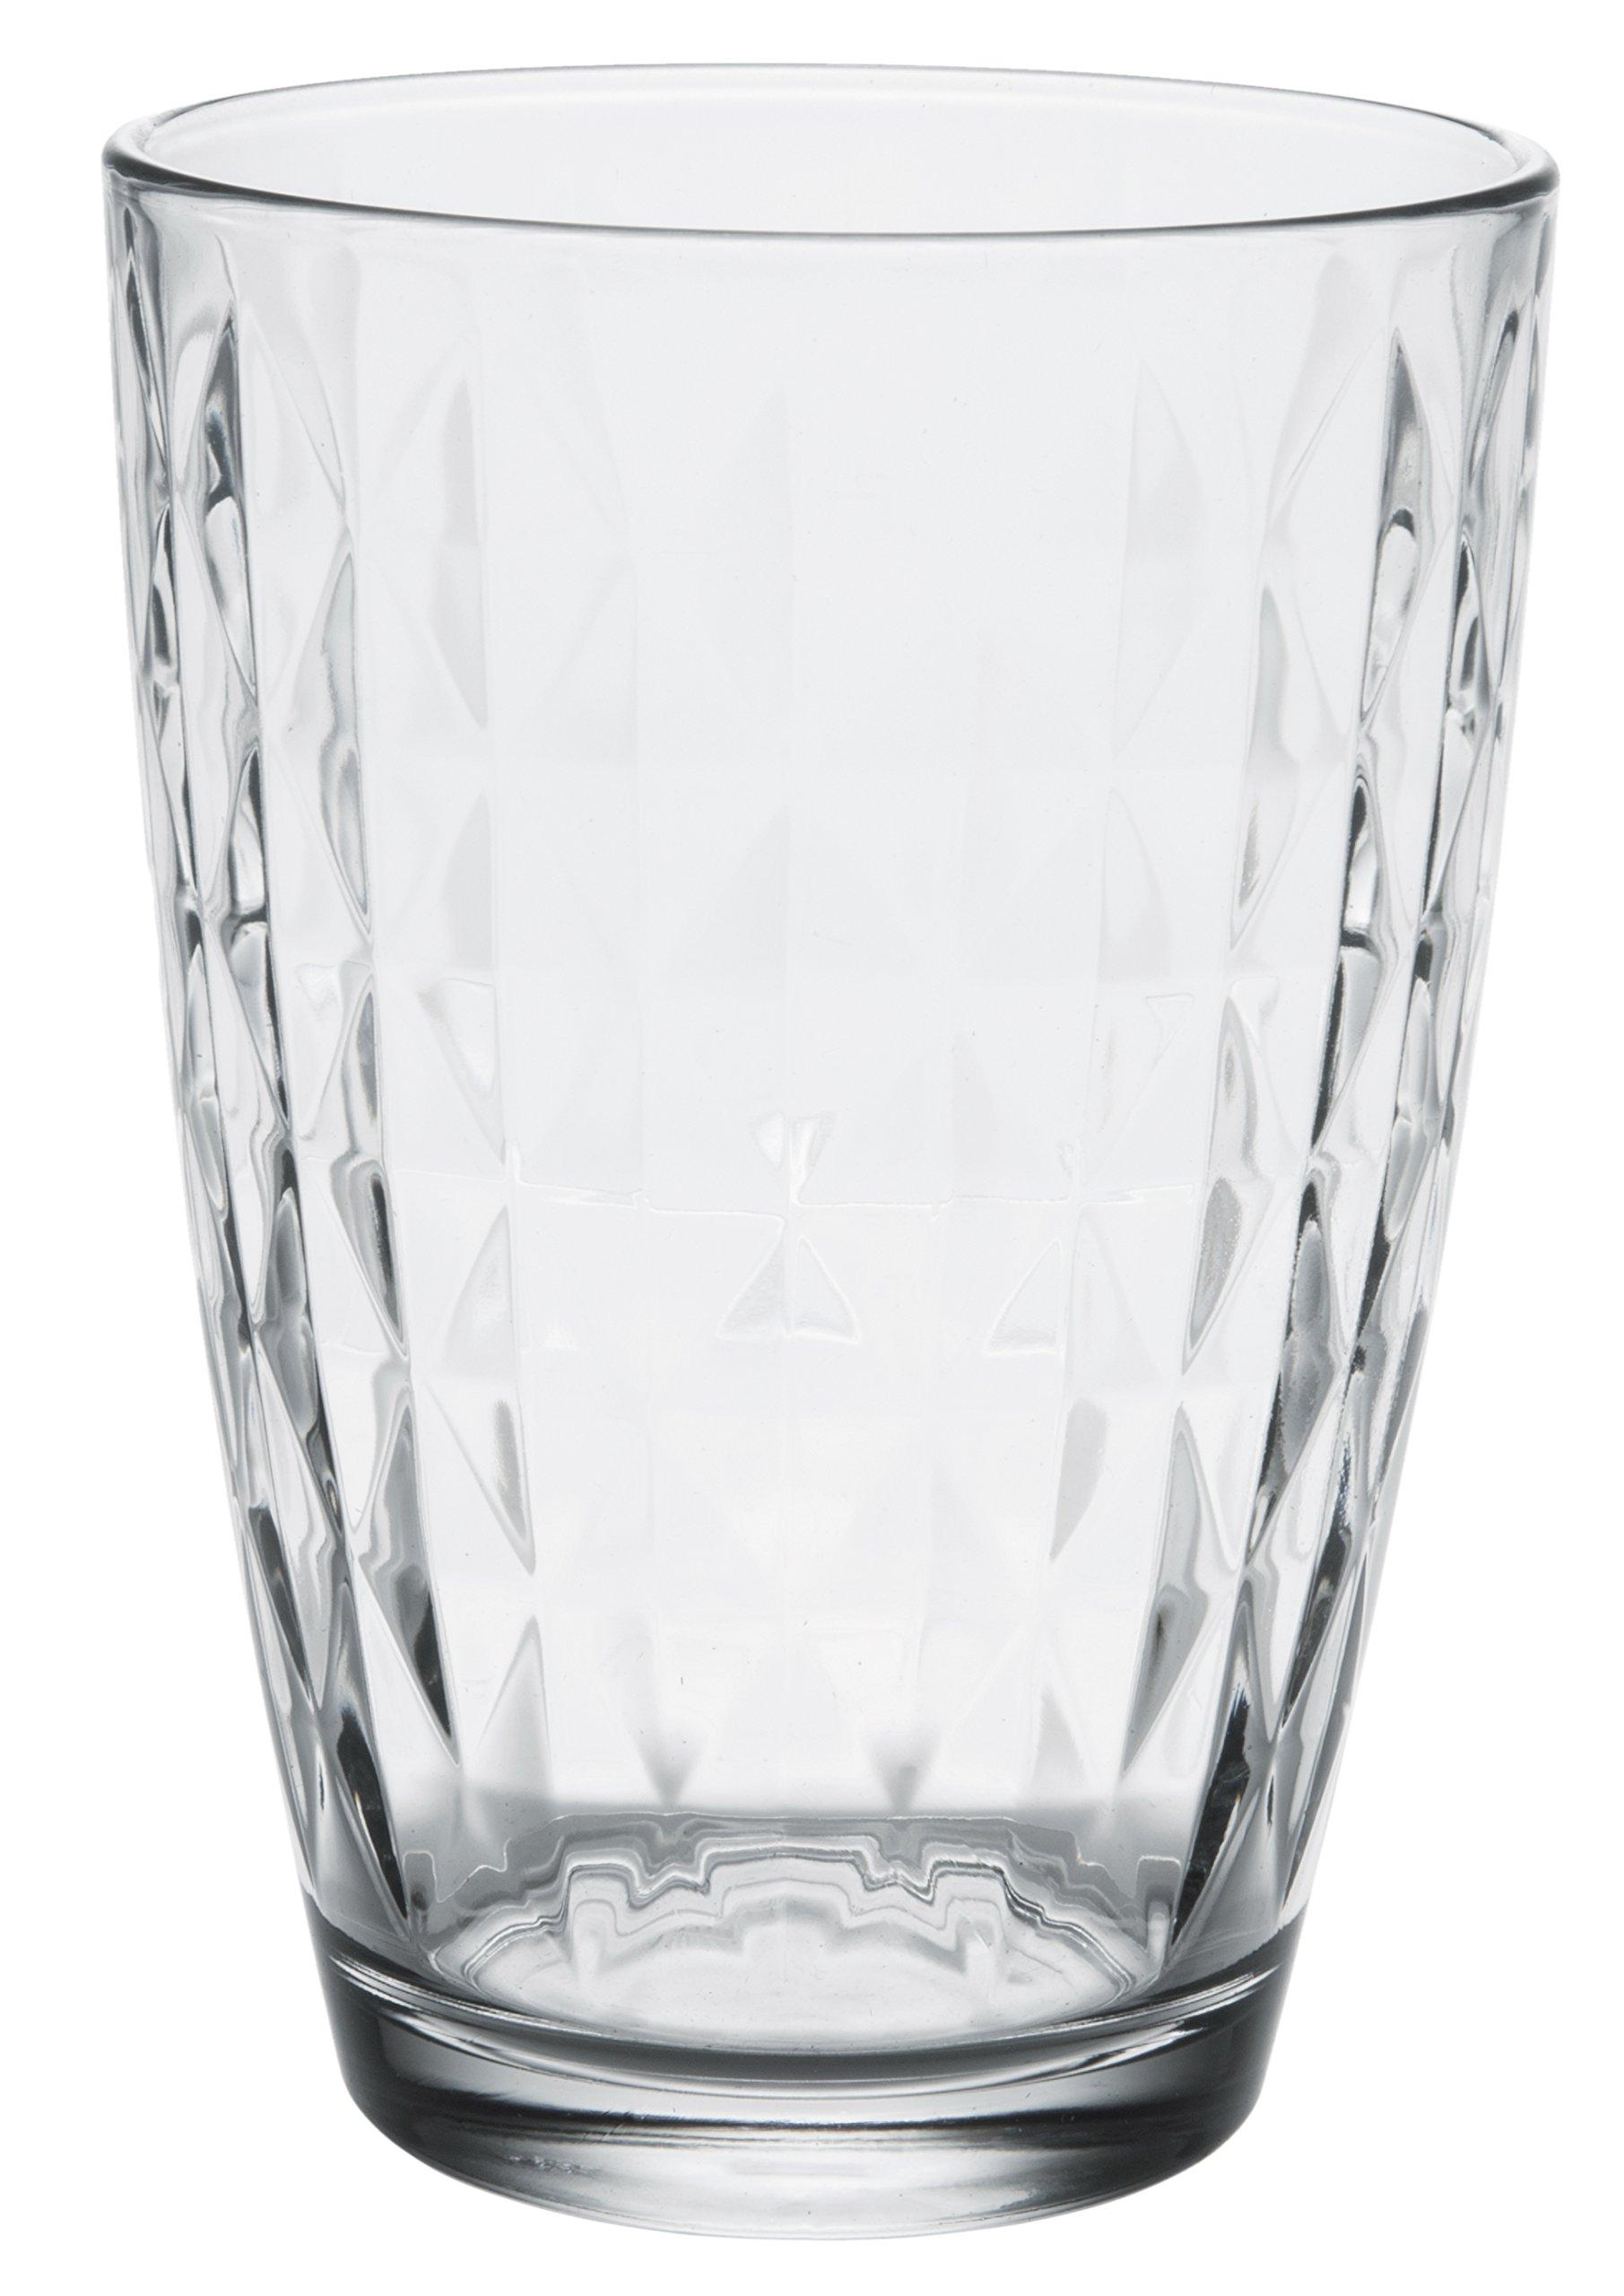 Artemis Modern Clear Glass Tall Iced Tea Cups, Drinking Glasses Water Juice Soda Beverage Tumblers, Set of 6, 14 fl oz